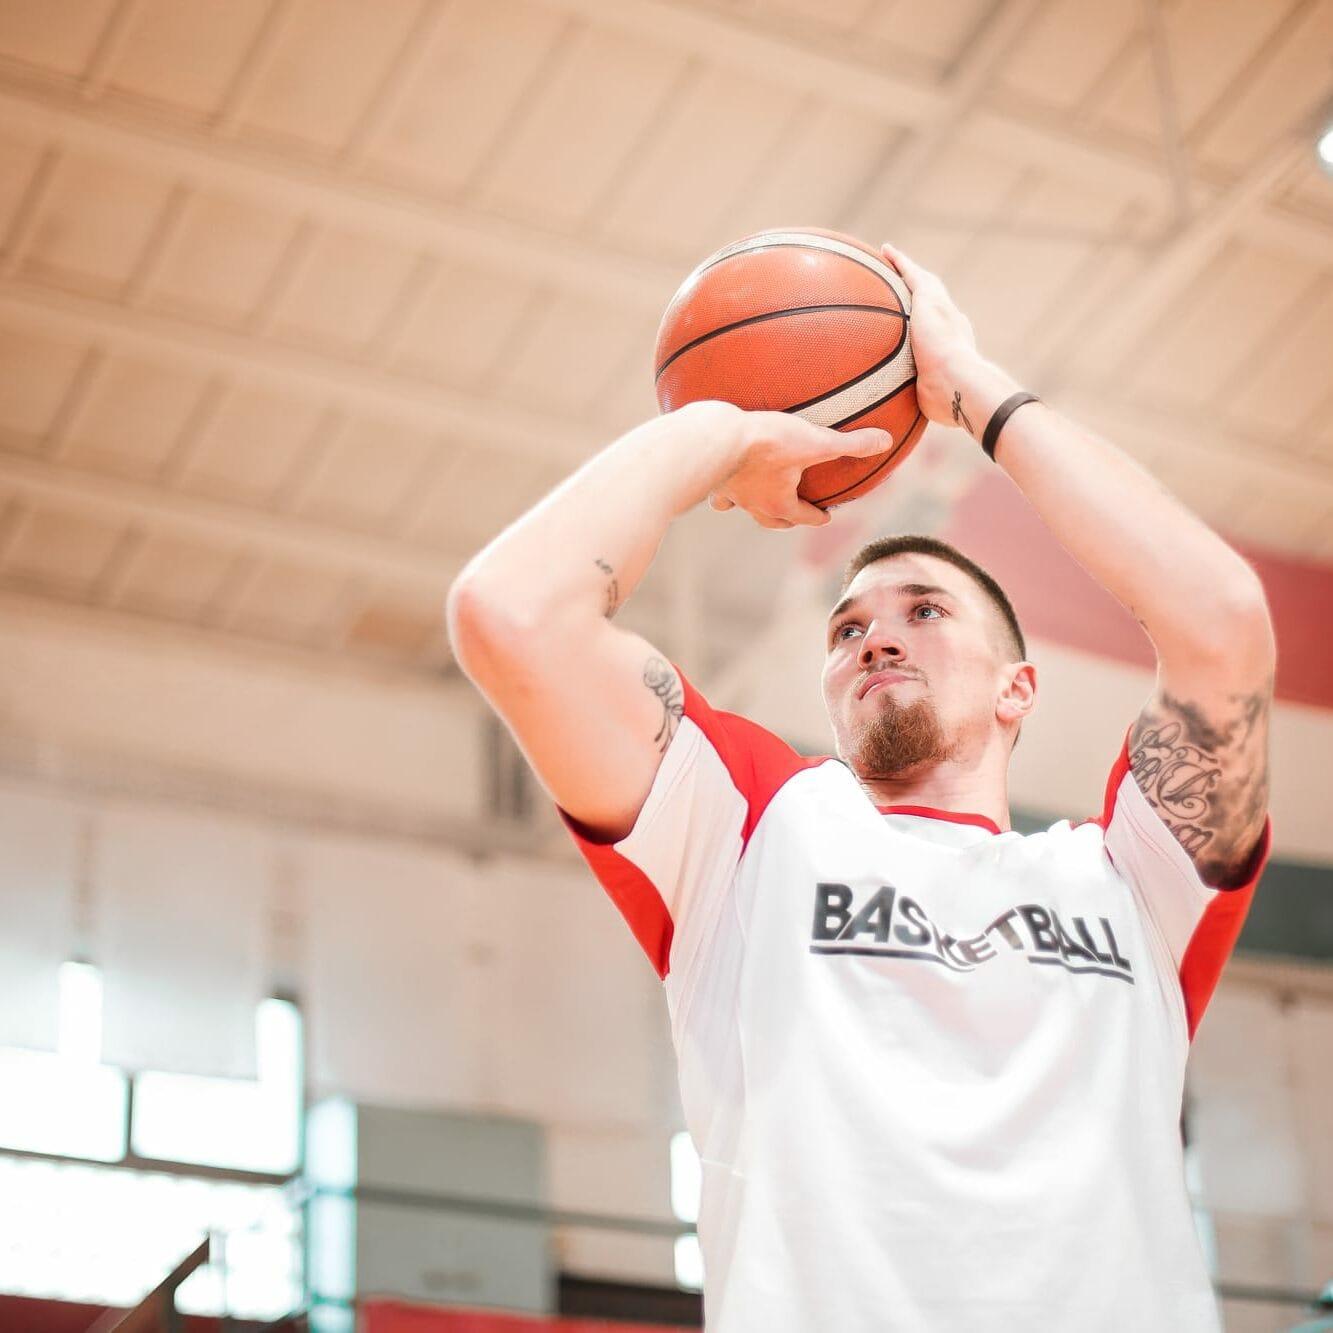 Man in white shirt shooting a basketball